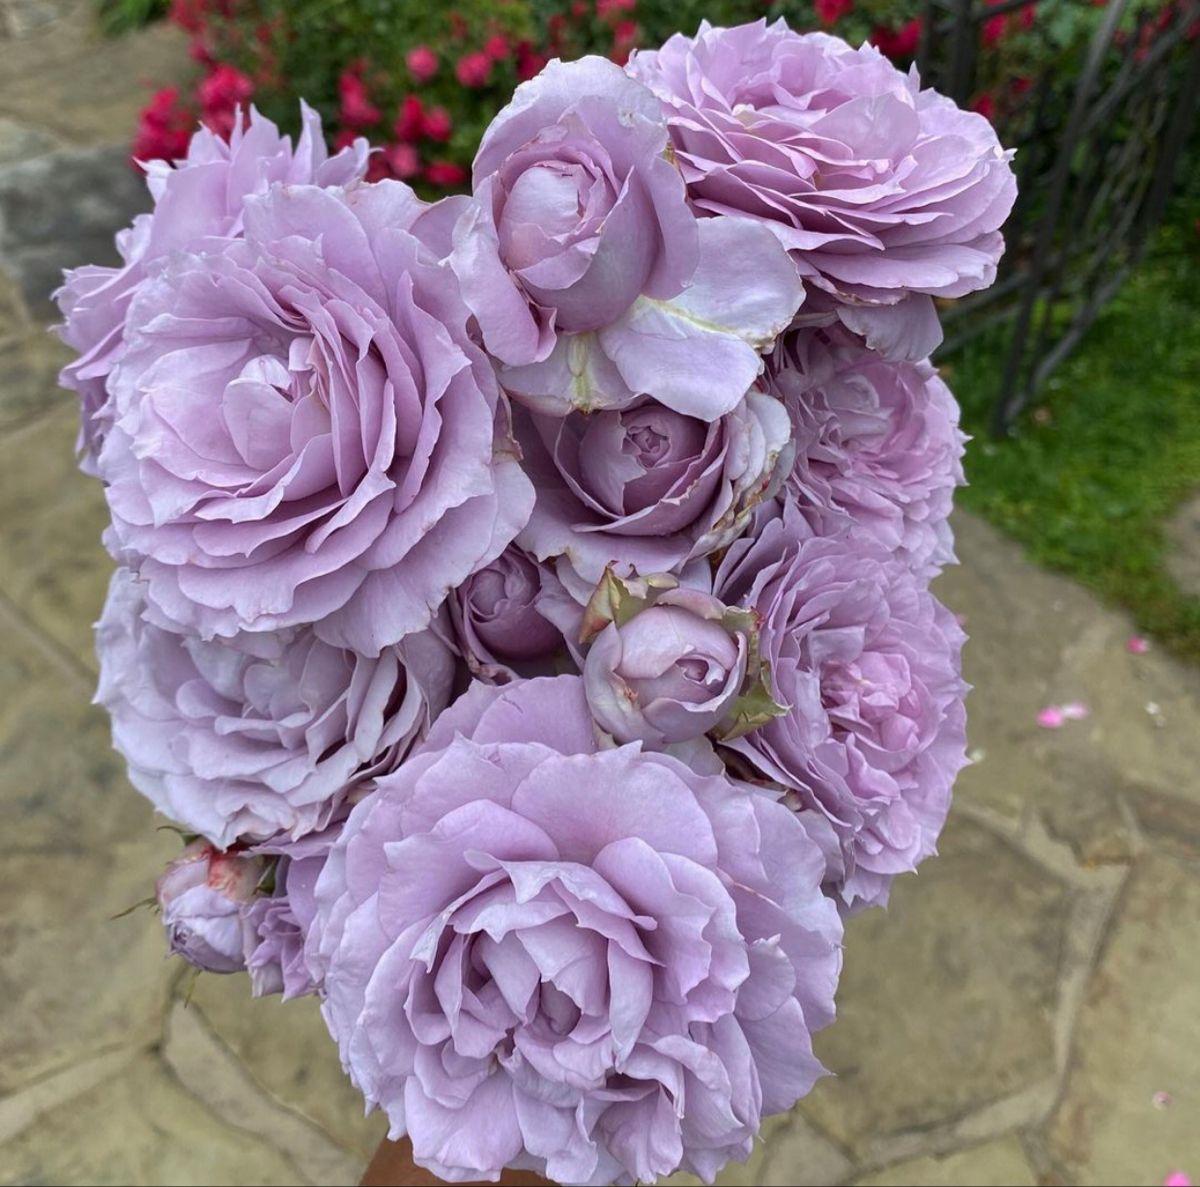 Lavender Garden Roses In 2020 Wholesale Flowers Lavender Roses Lavender Flowers